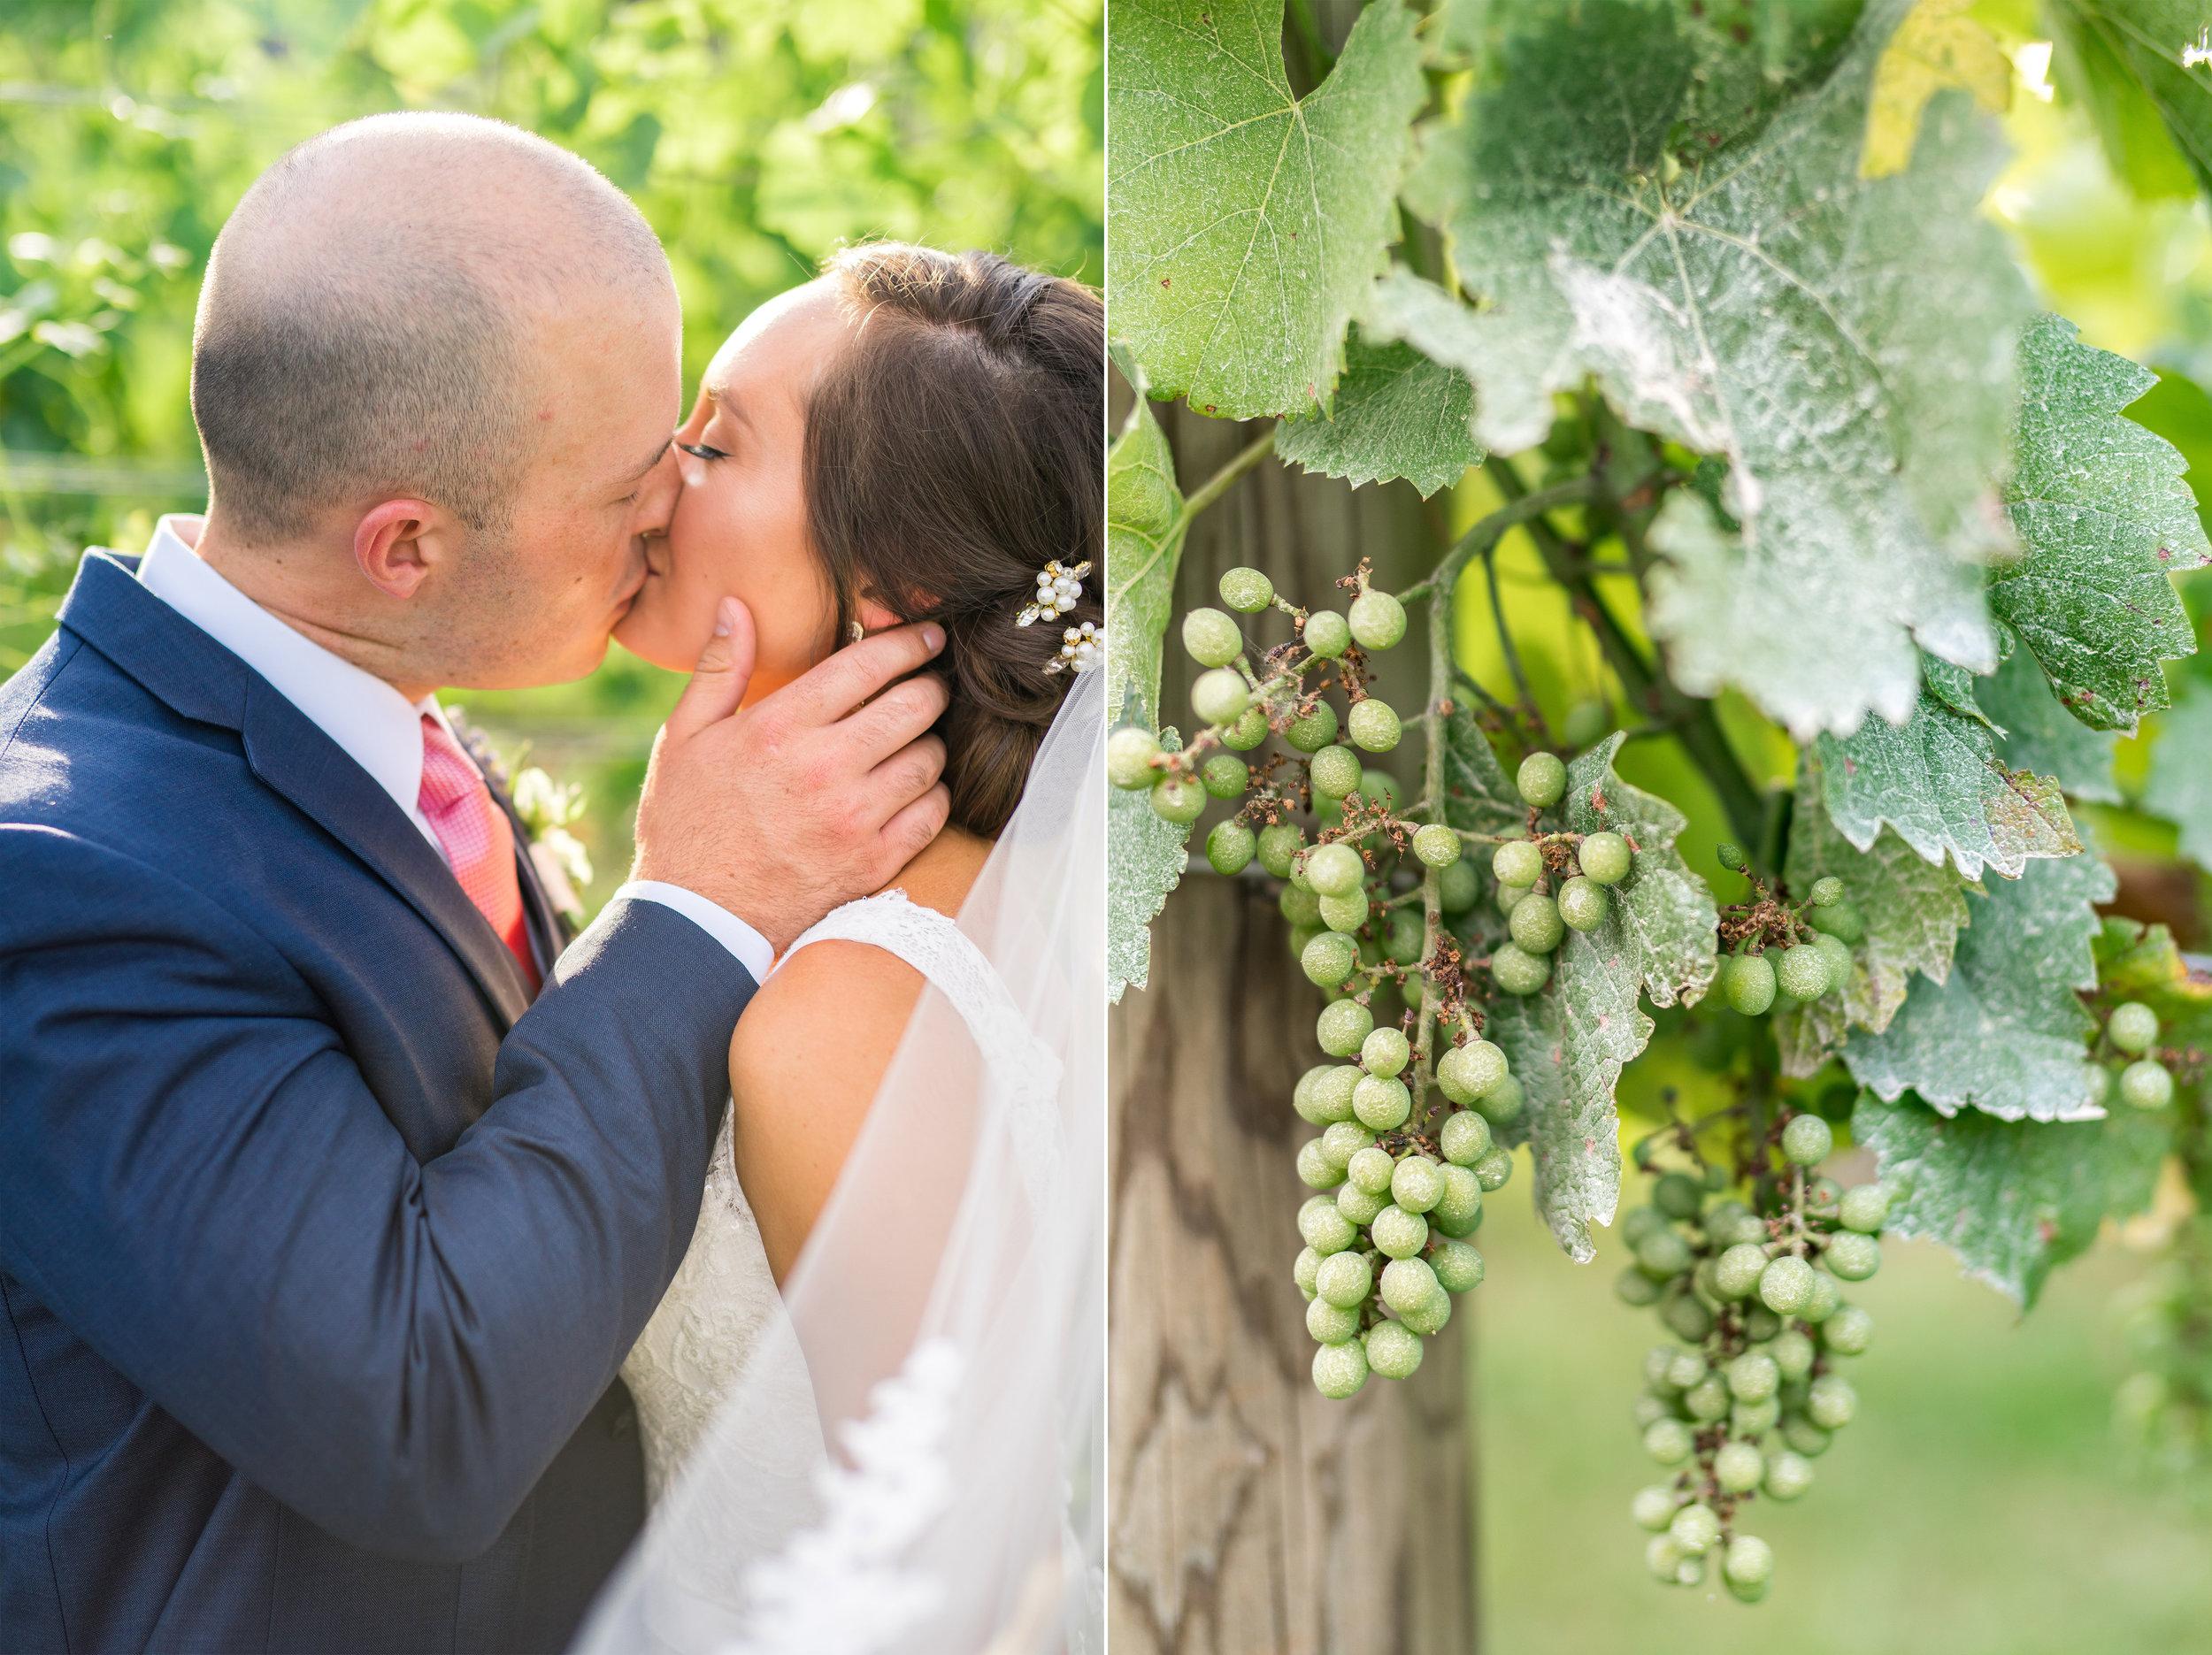 Vineyard wedding in Thurmont Maryland Springfield Manor